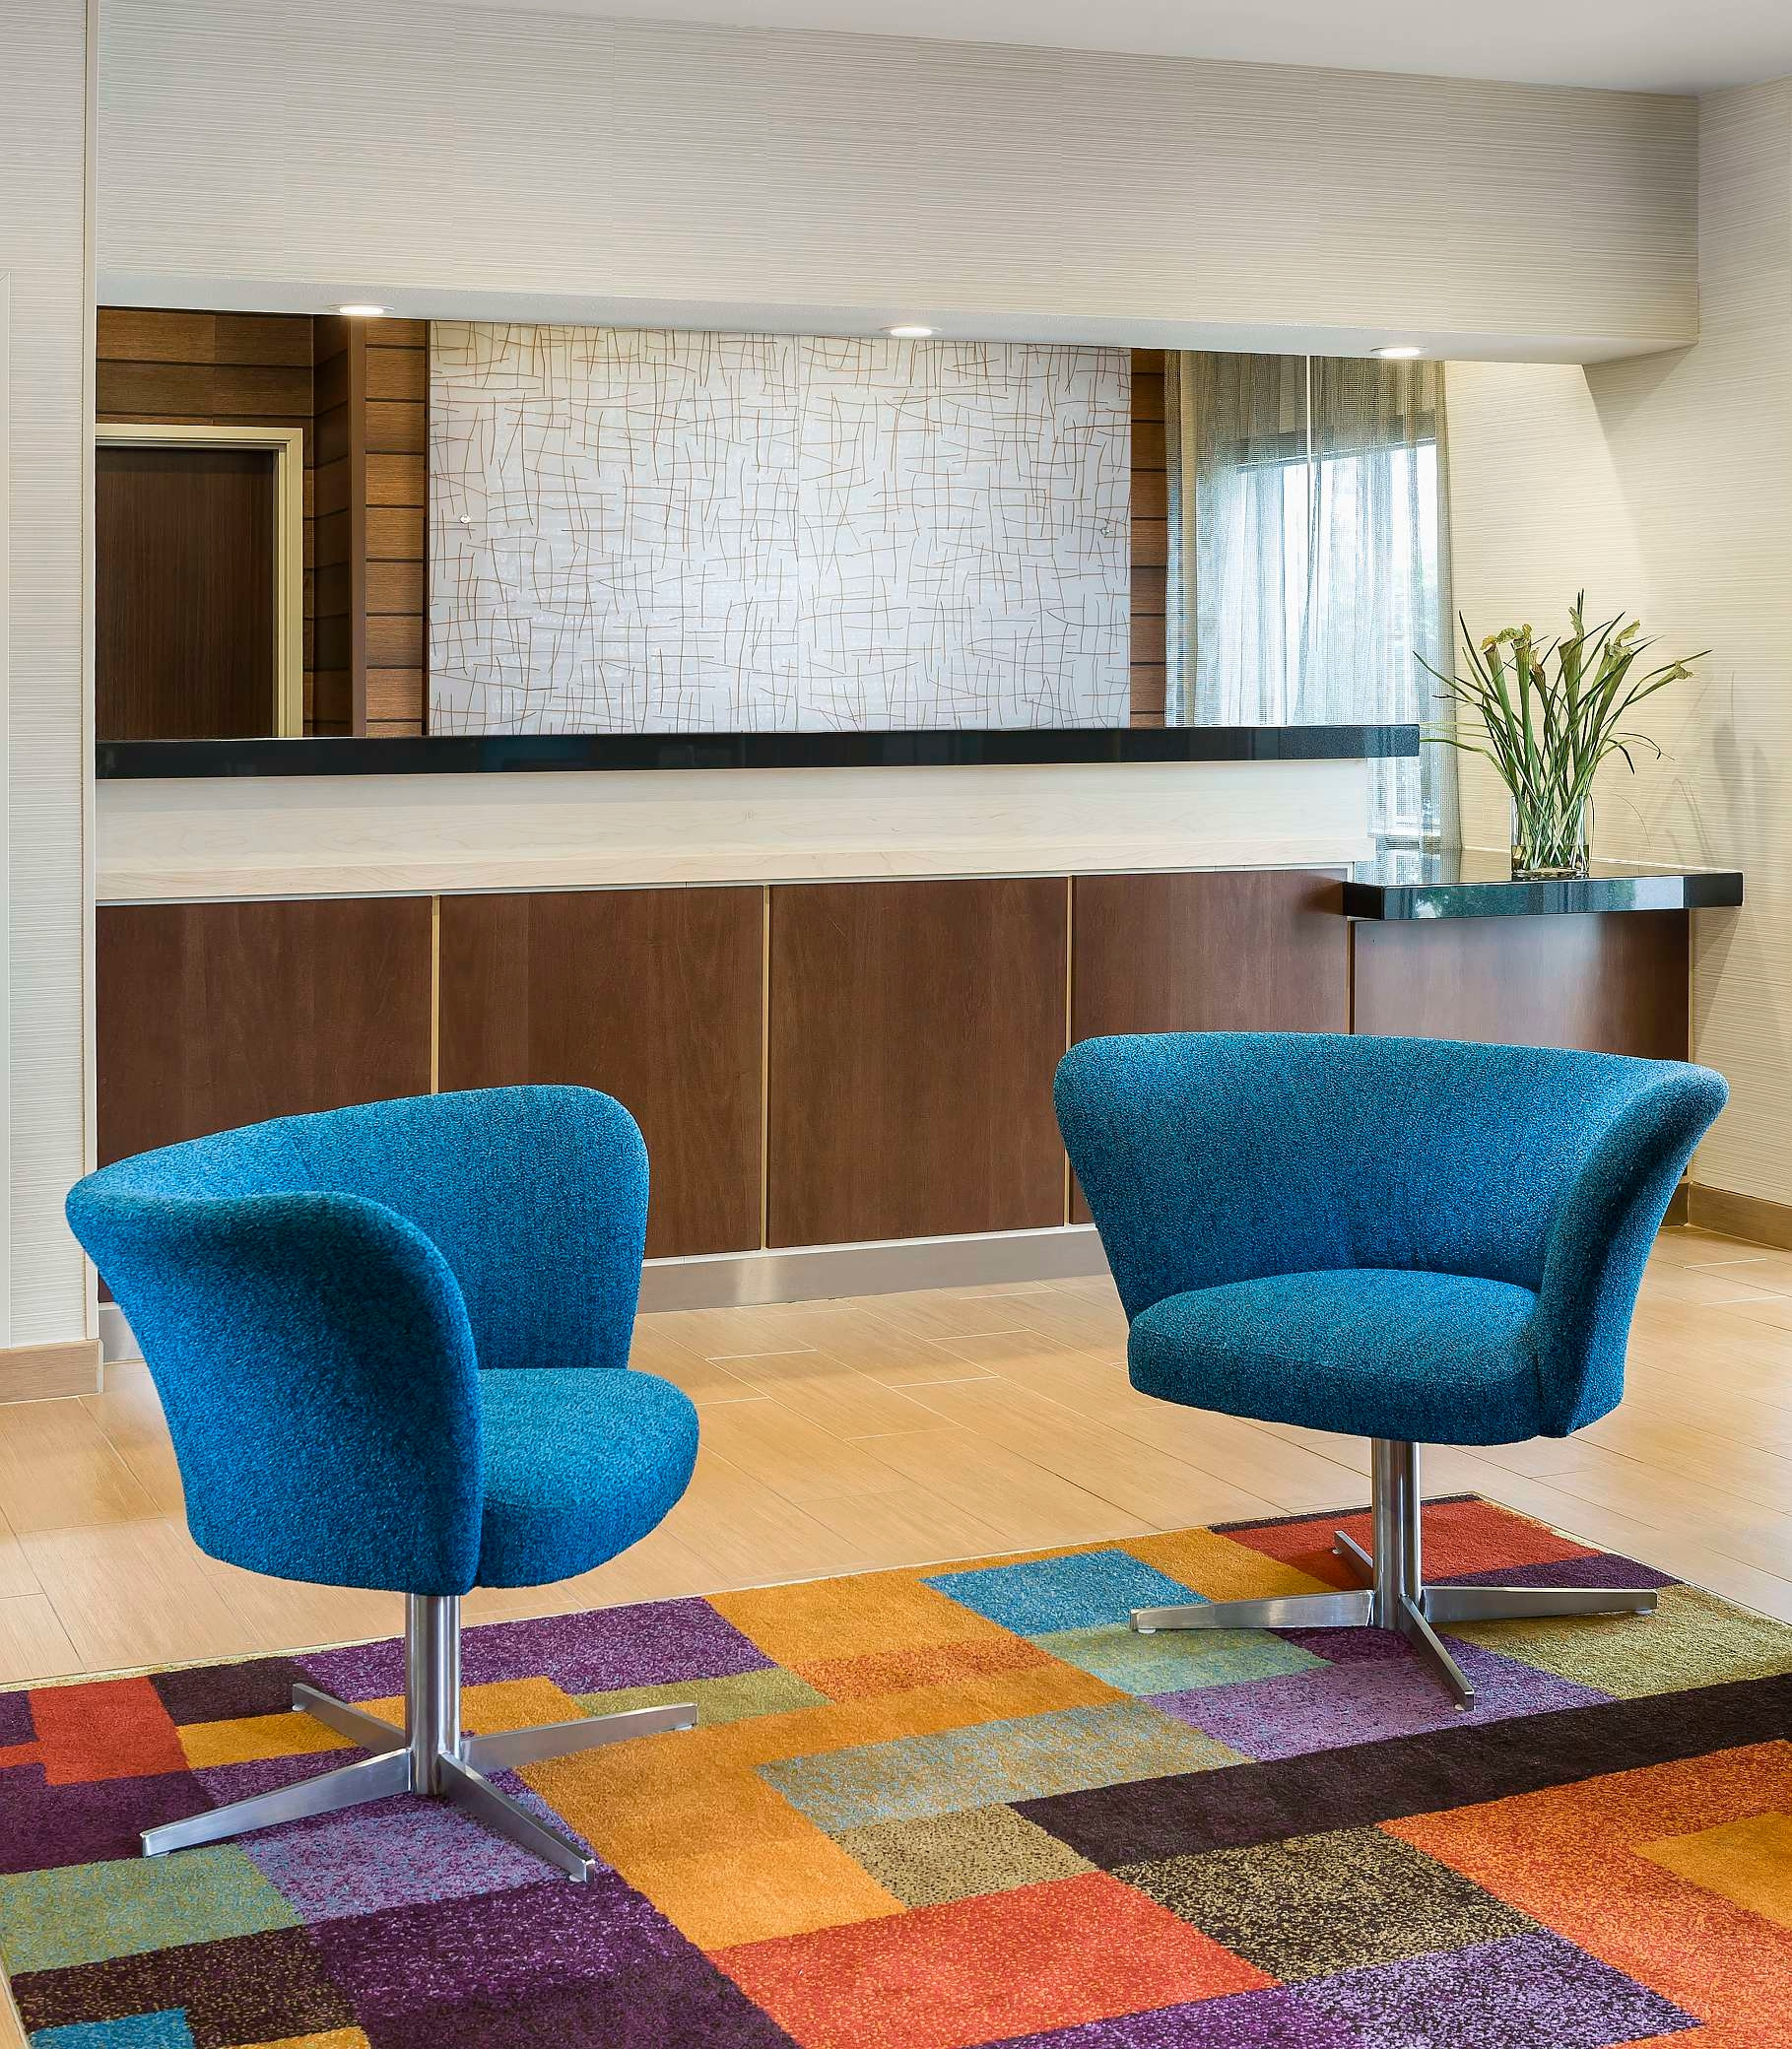 Fairfield Inn & Suites by Marriott Jackson image 10